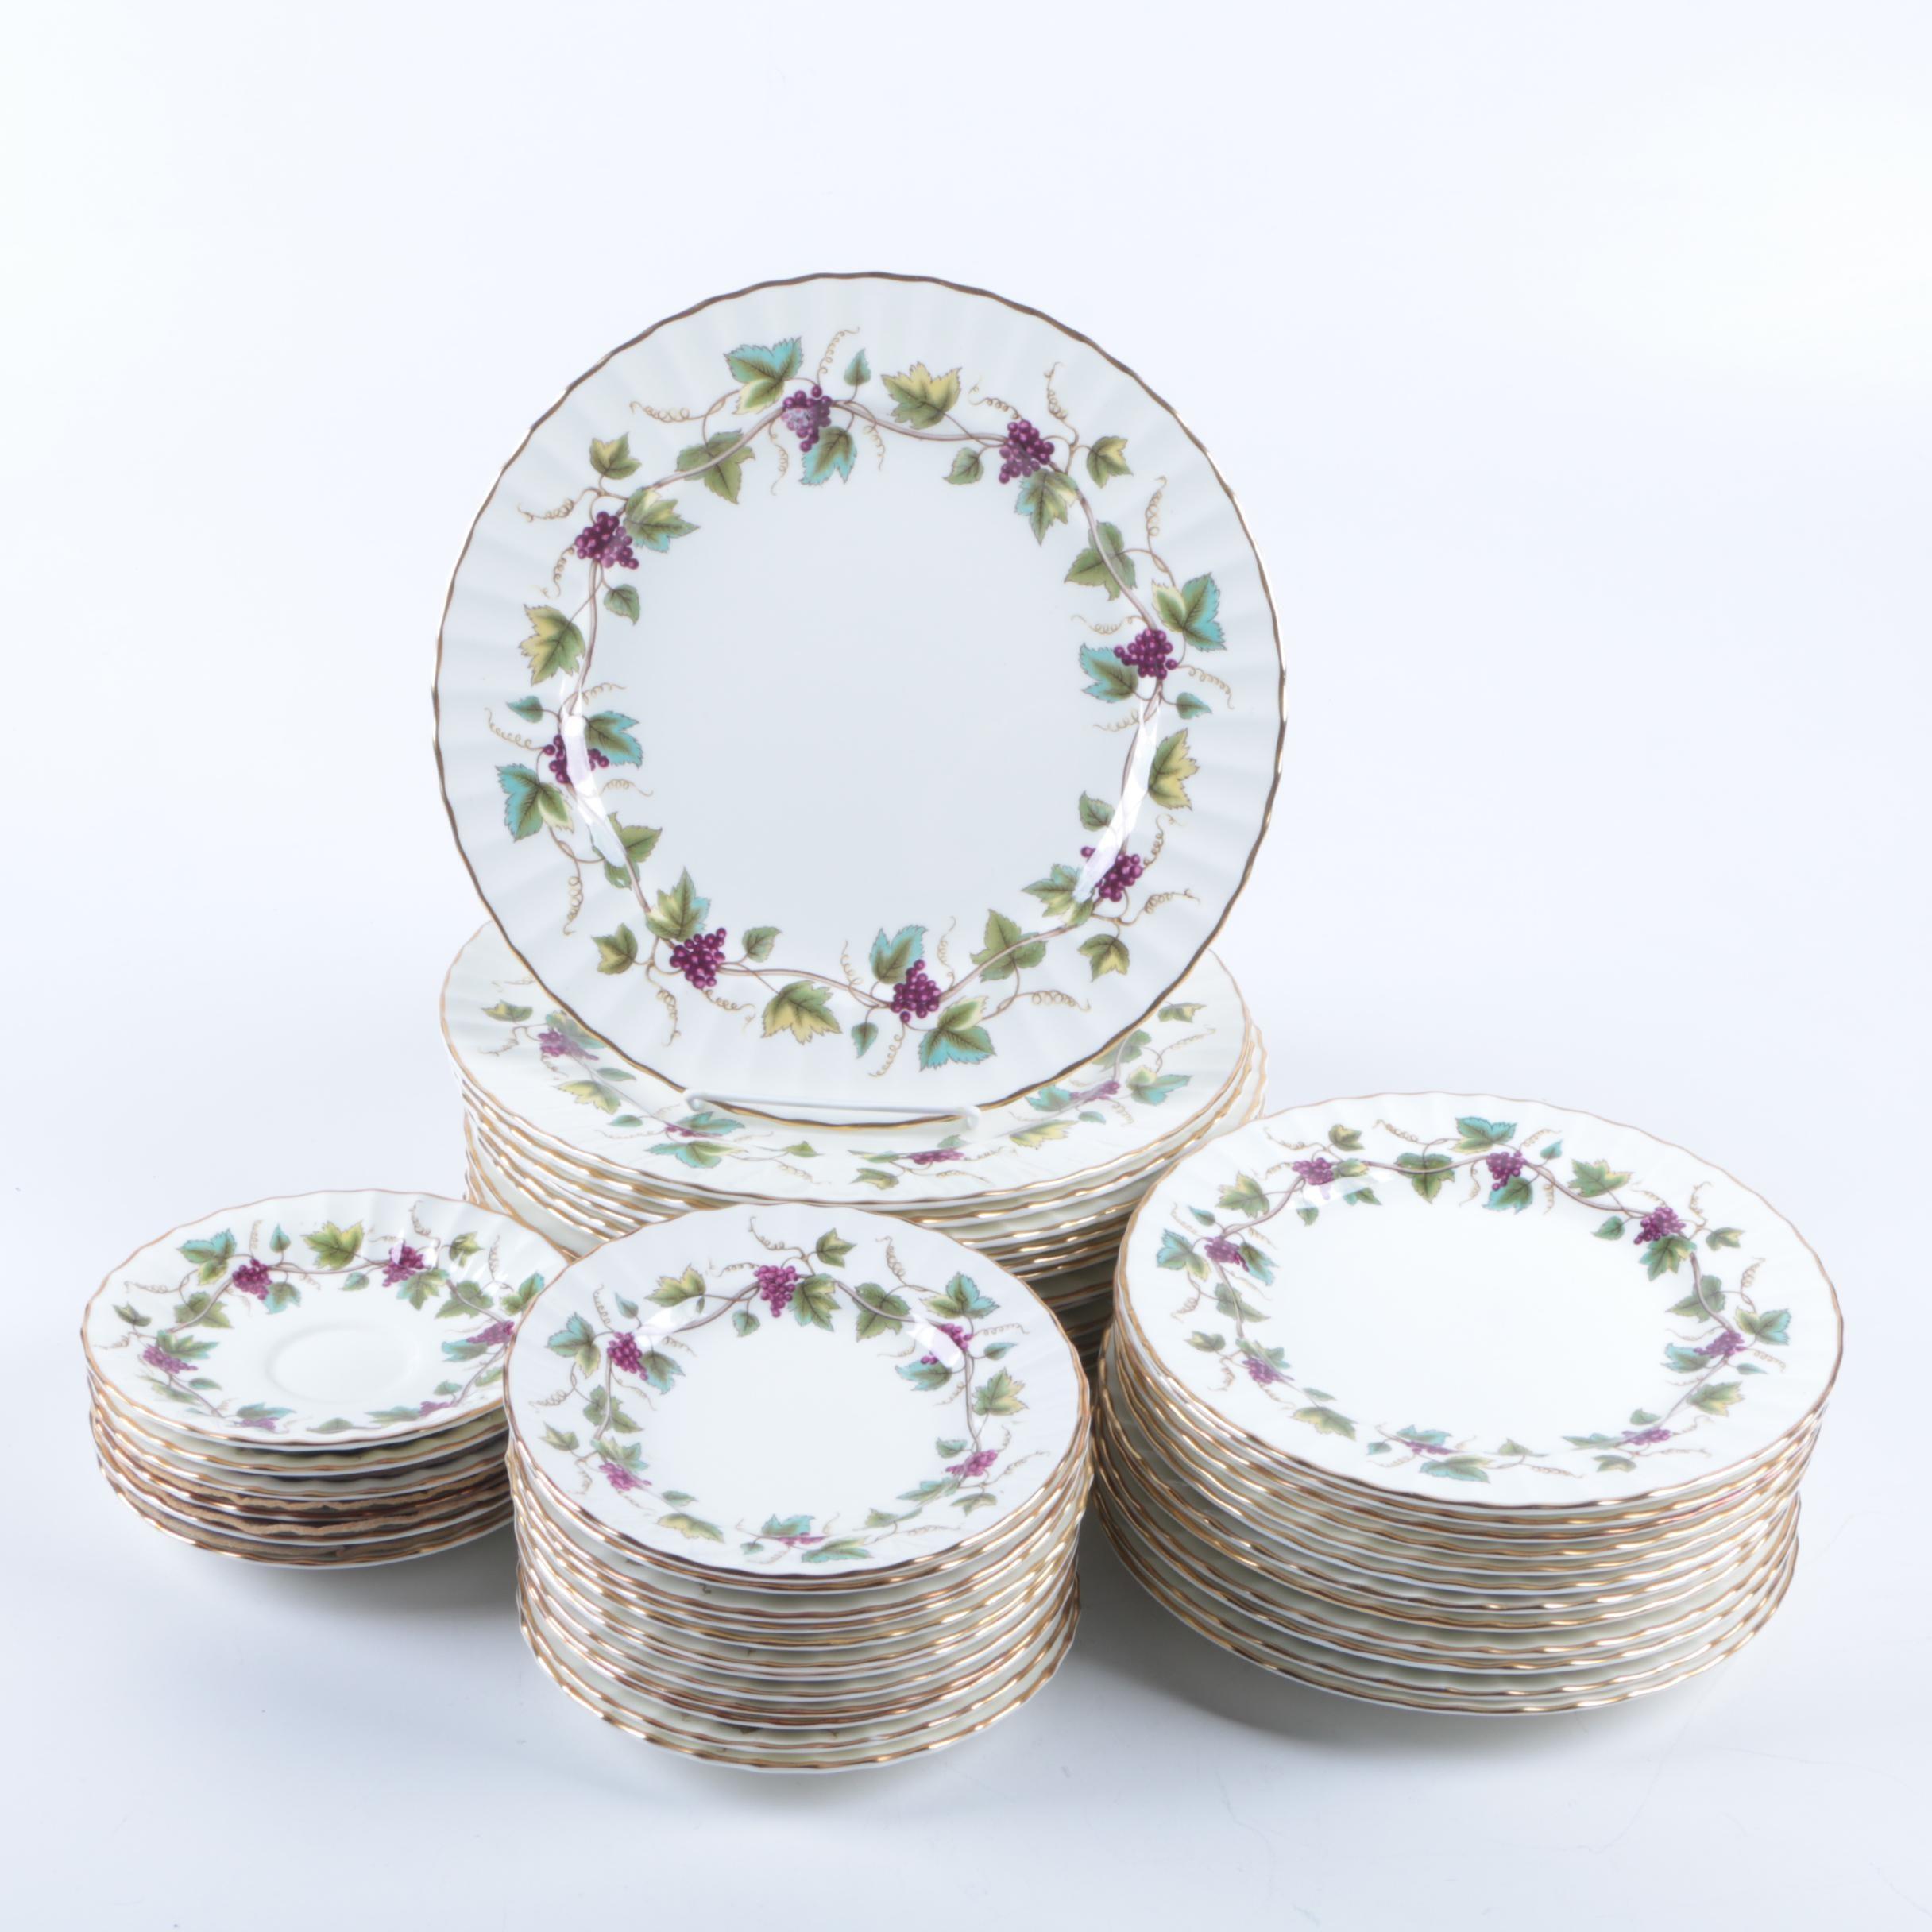 Royal Worcester  Bacchanal  Bone China Tableware ...  sc 1 st  EBTH.com & Royal Worcester